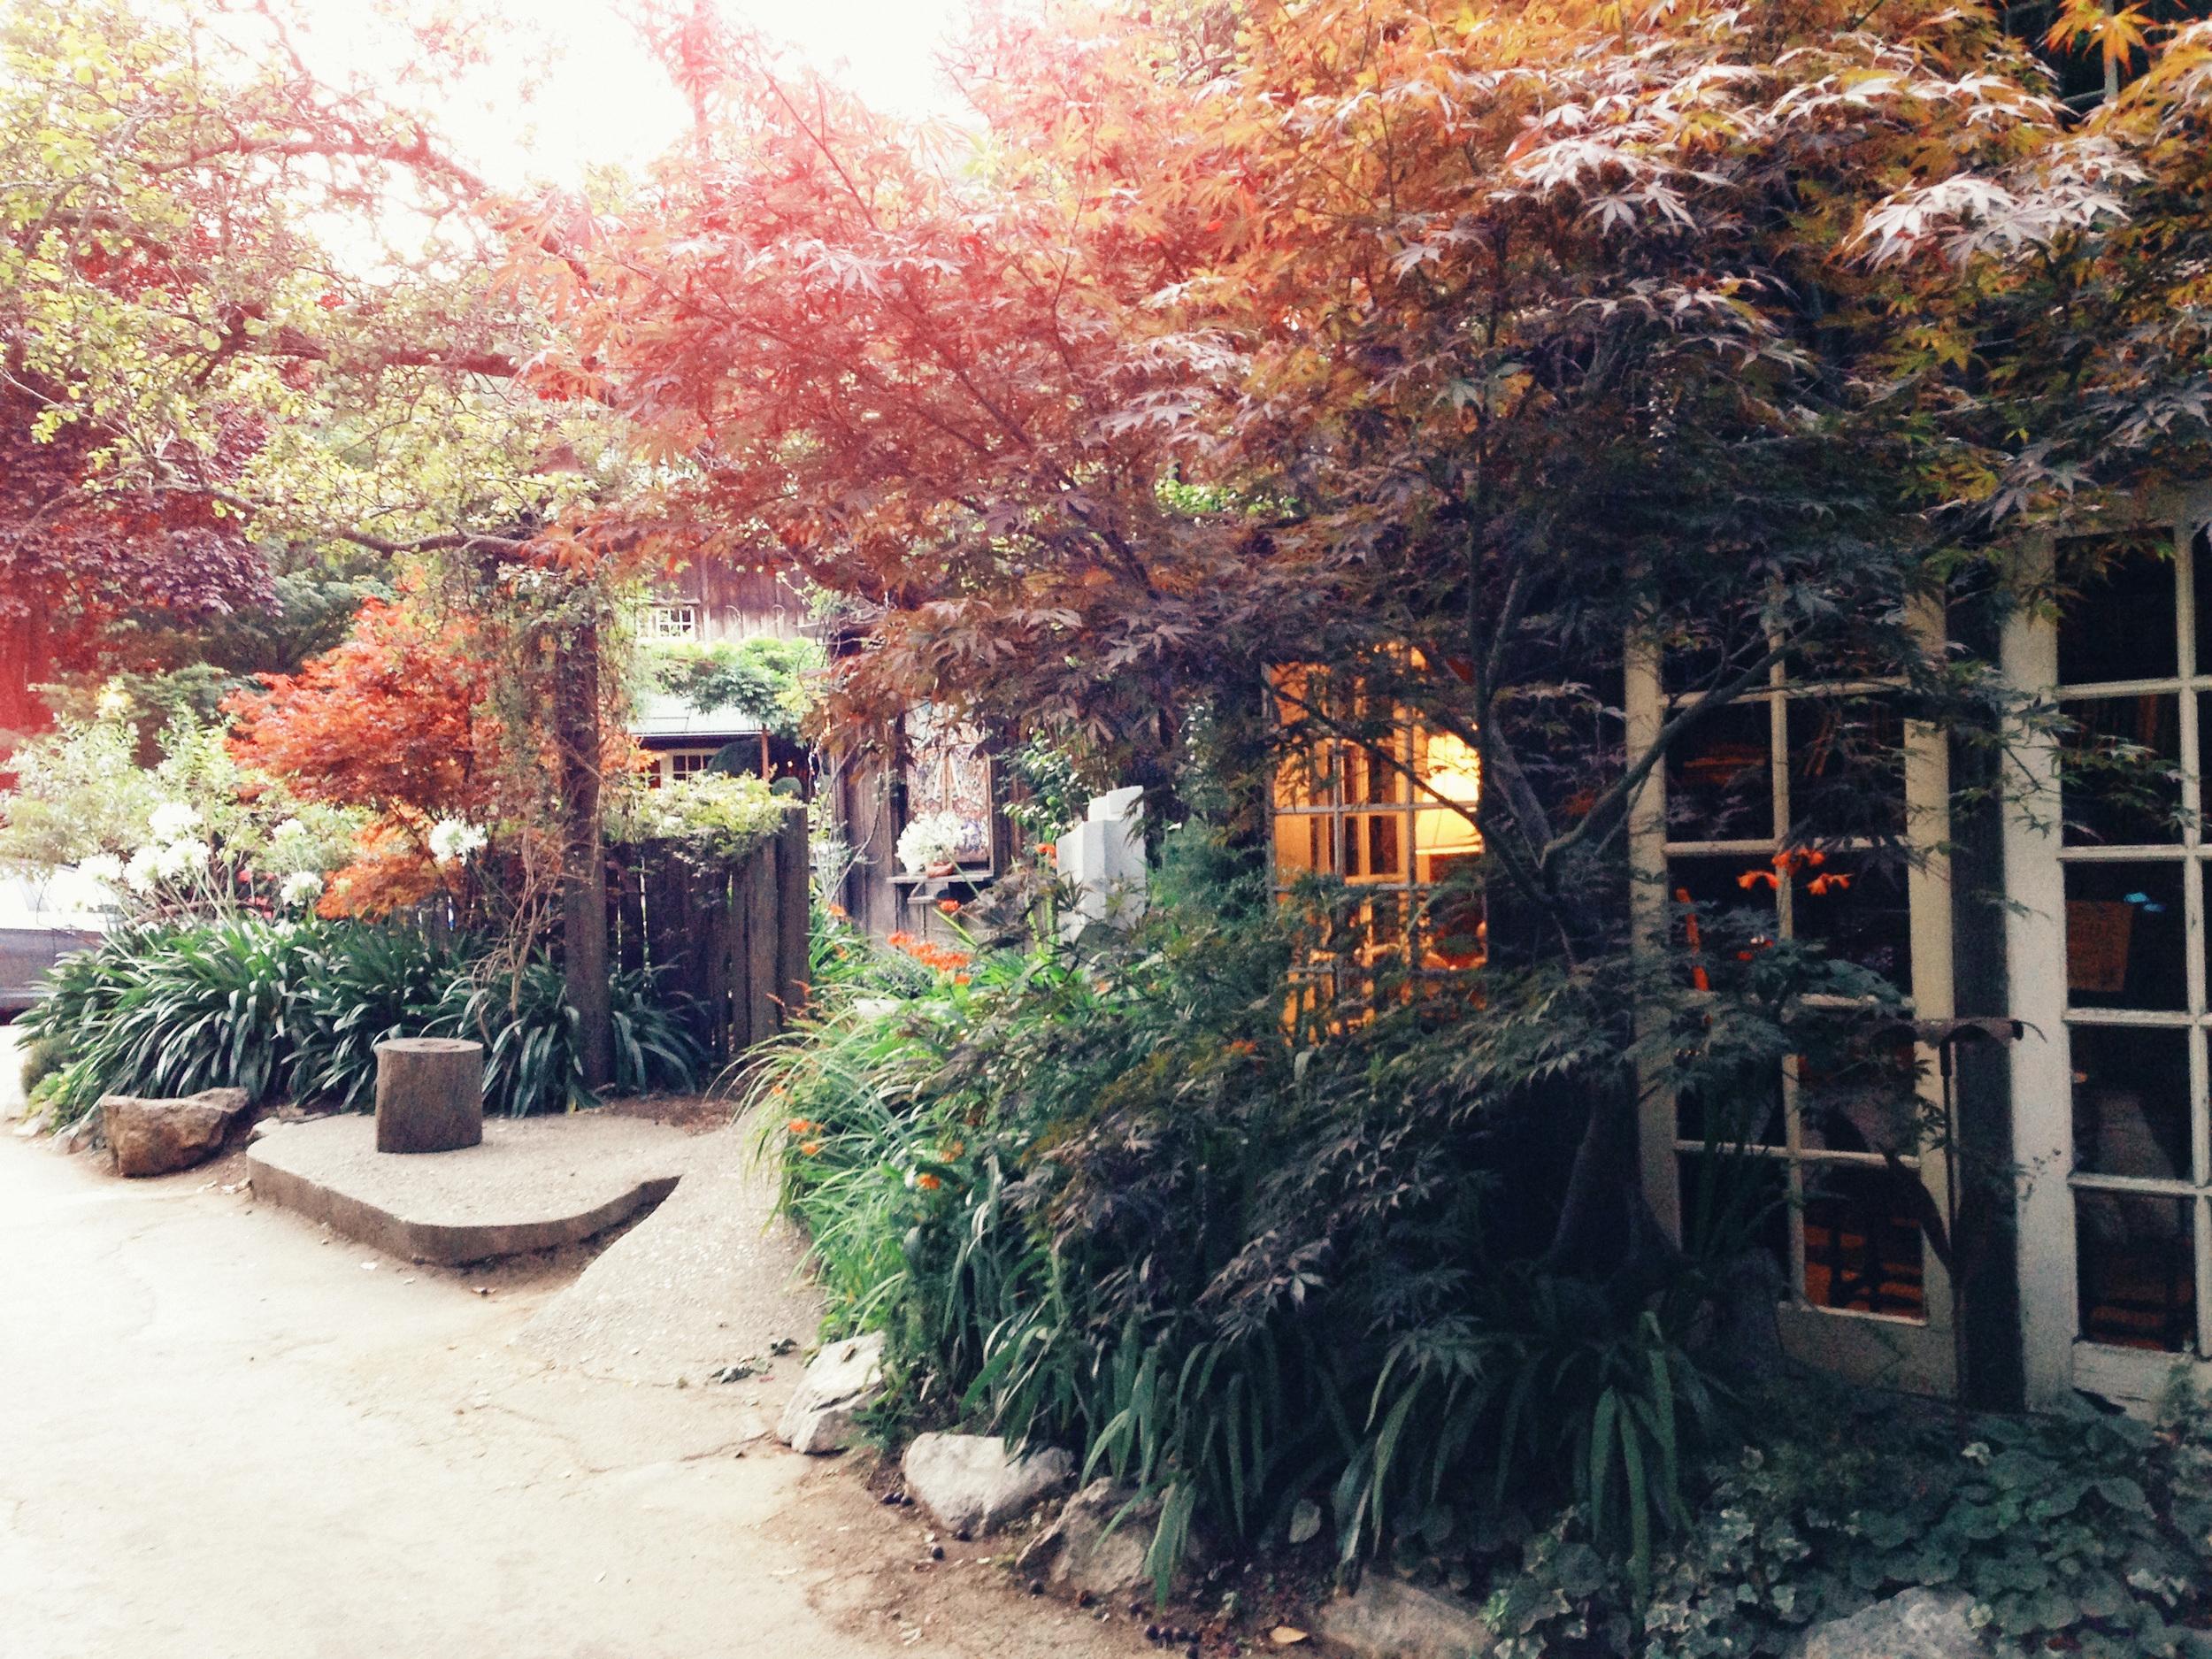 naomi_yamada_big_sur_california_(7_of_11).jpg